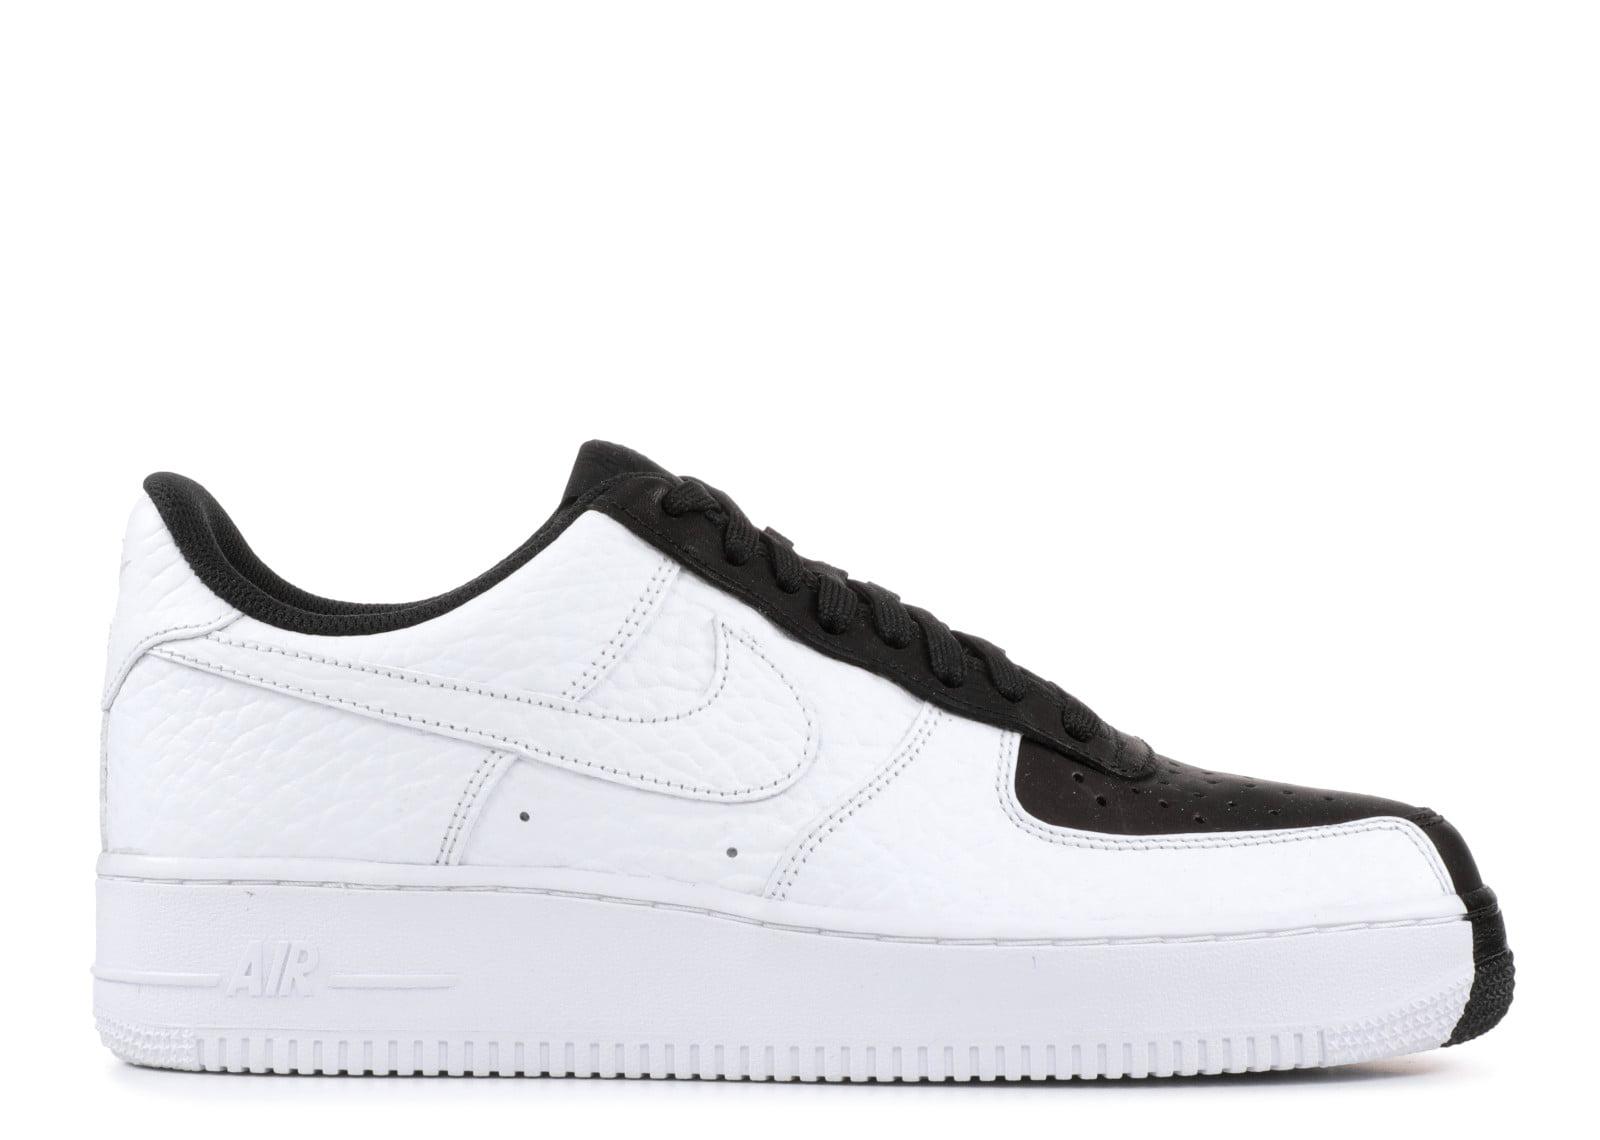 Men's Nike Air Force 1 Low '07 LV8 'Split' Black & White 905345-004 -  Walmart.com